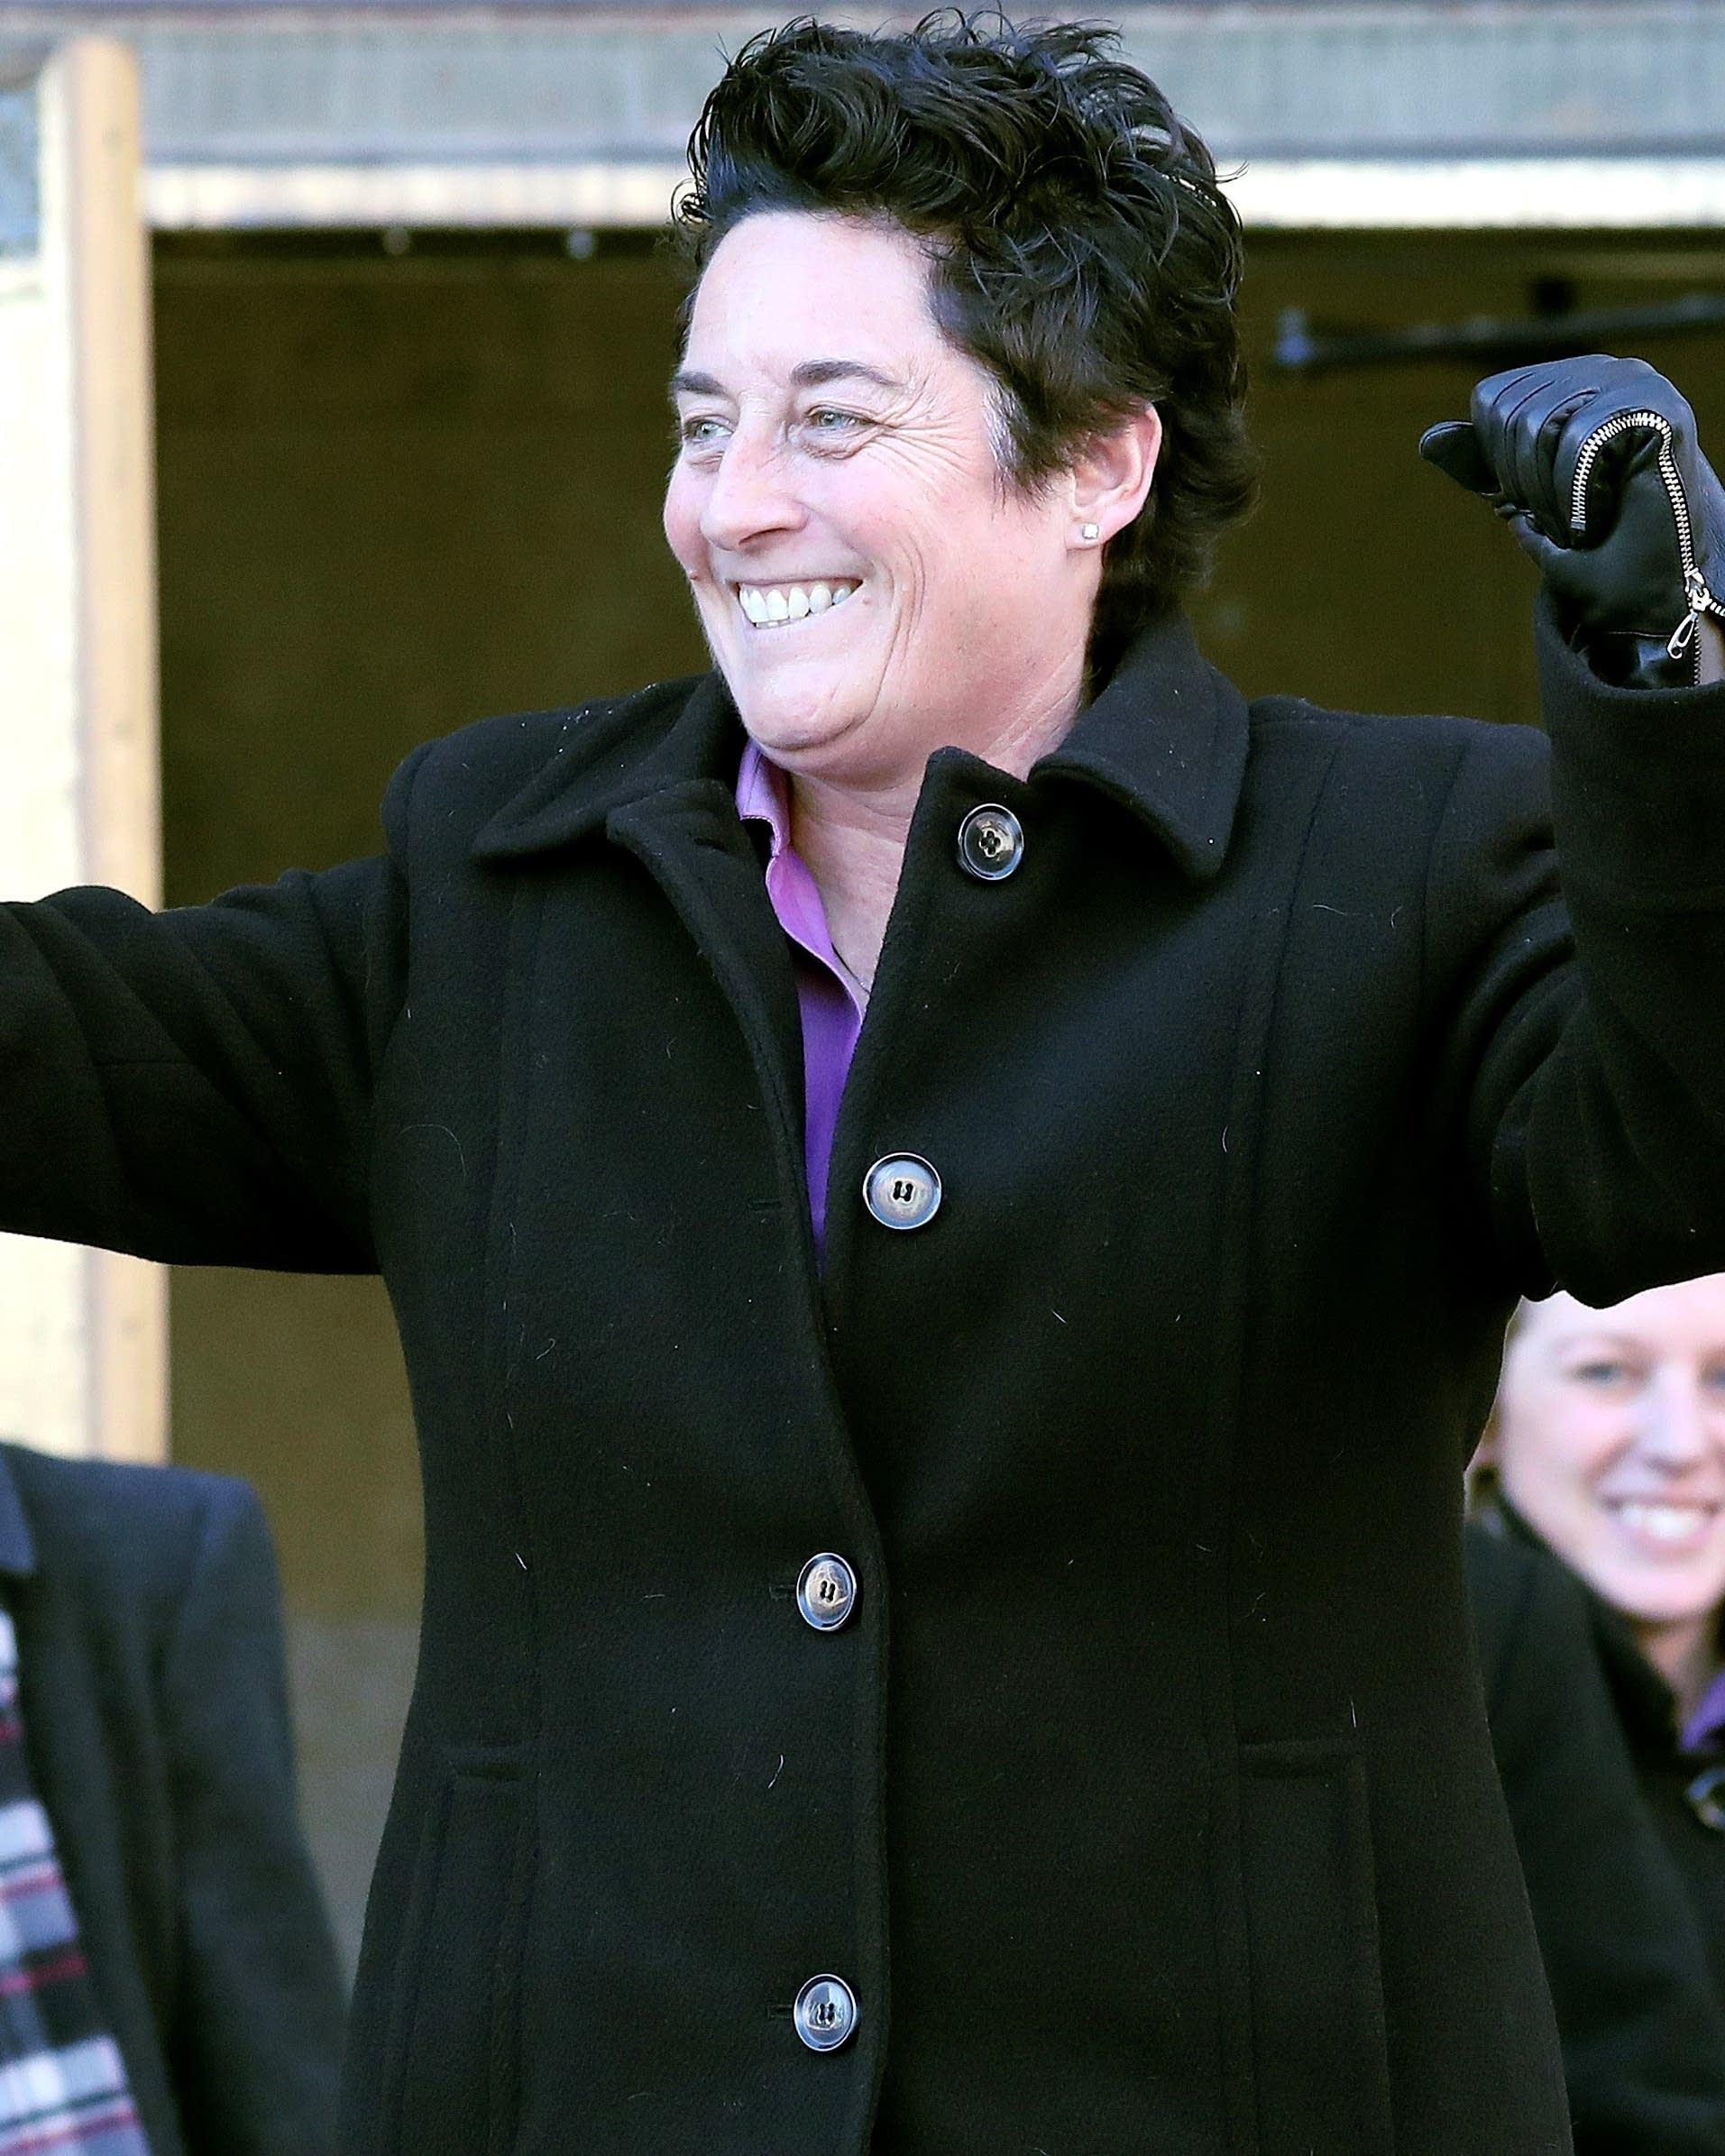 Jury backs ex-UMD hockey coach in discrimination suit